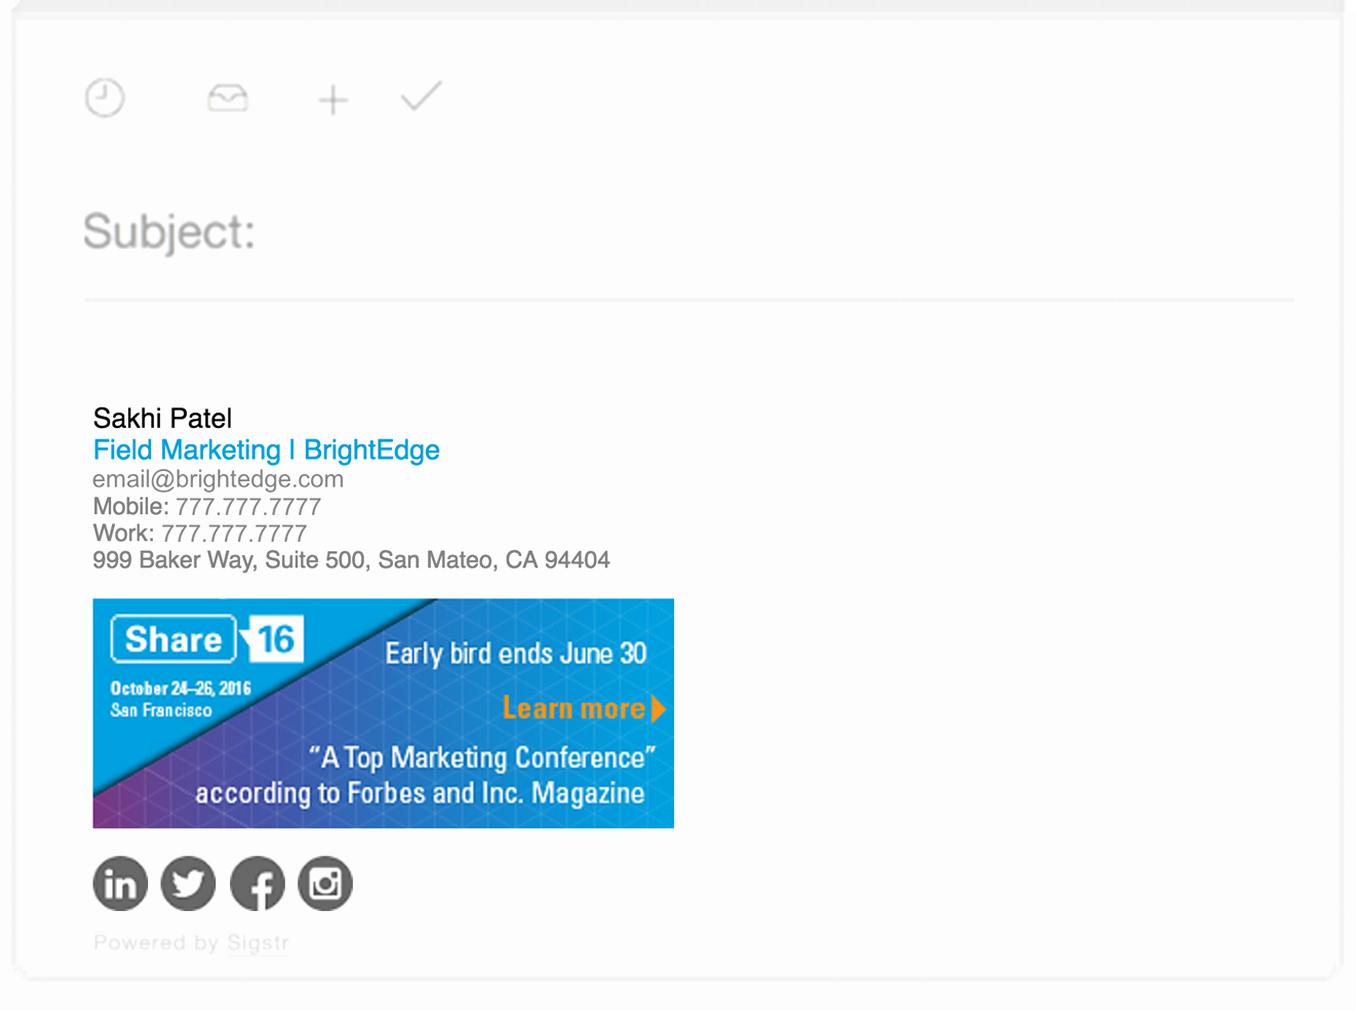 Html Email Signature Template Fresh 16 Digital Marketing events Our Radar